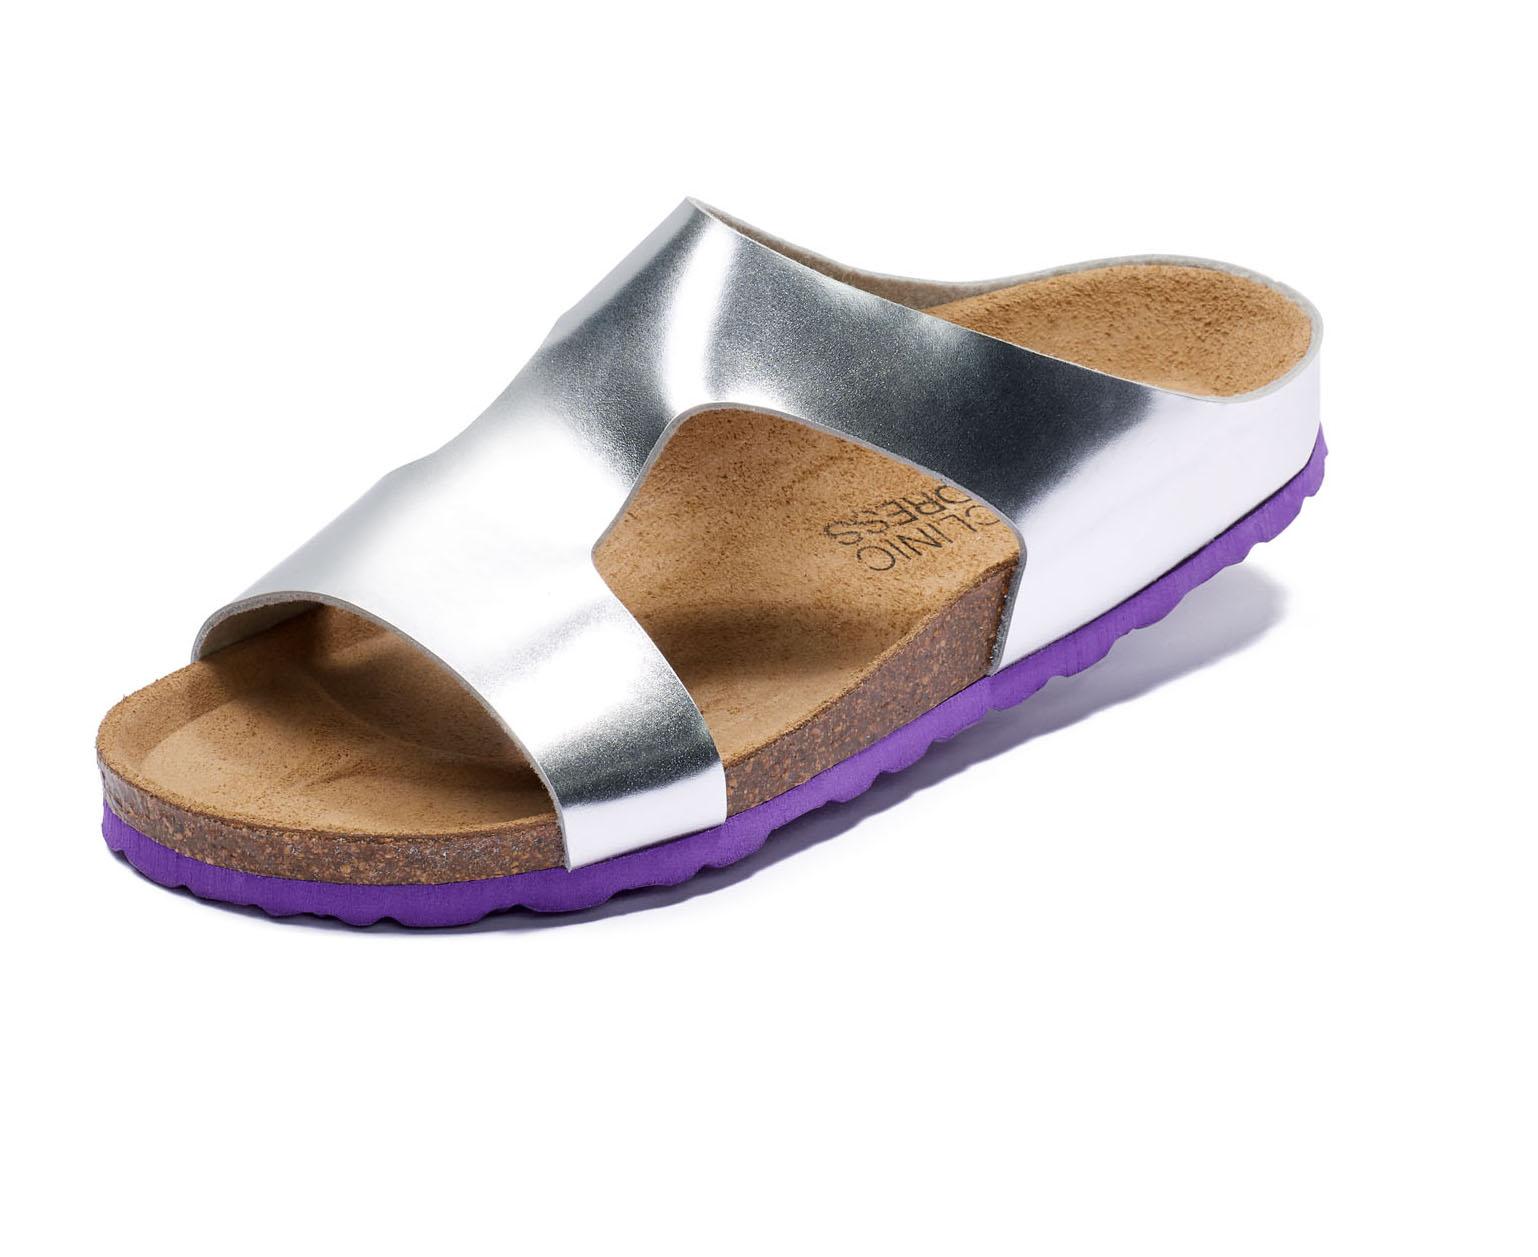 Clinic Dress Bio Damen Clogs Pantolette Sandalen Slipper Komfort Schuhe silber | dynamic